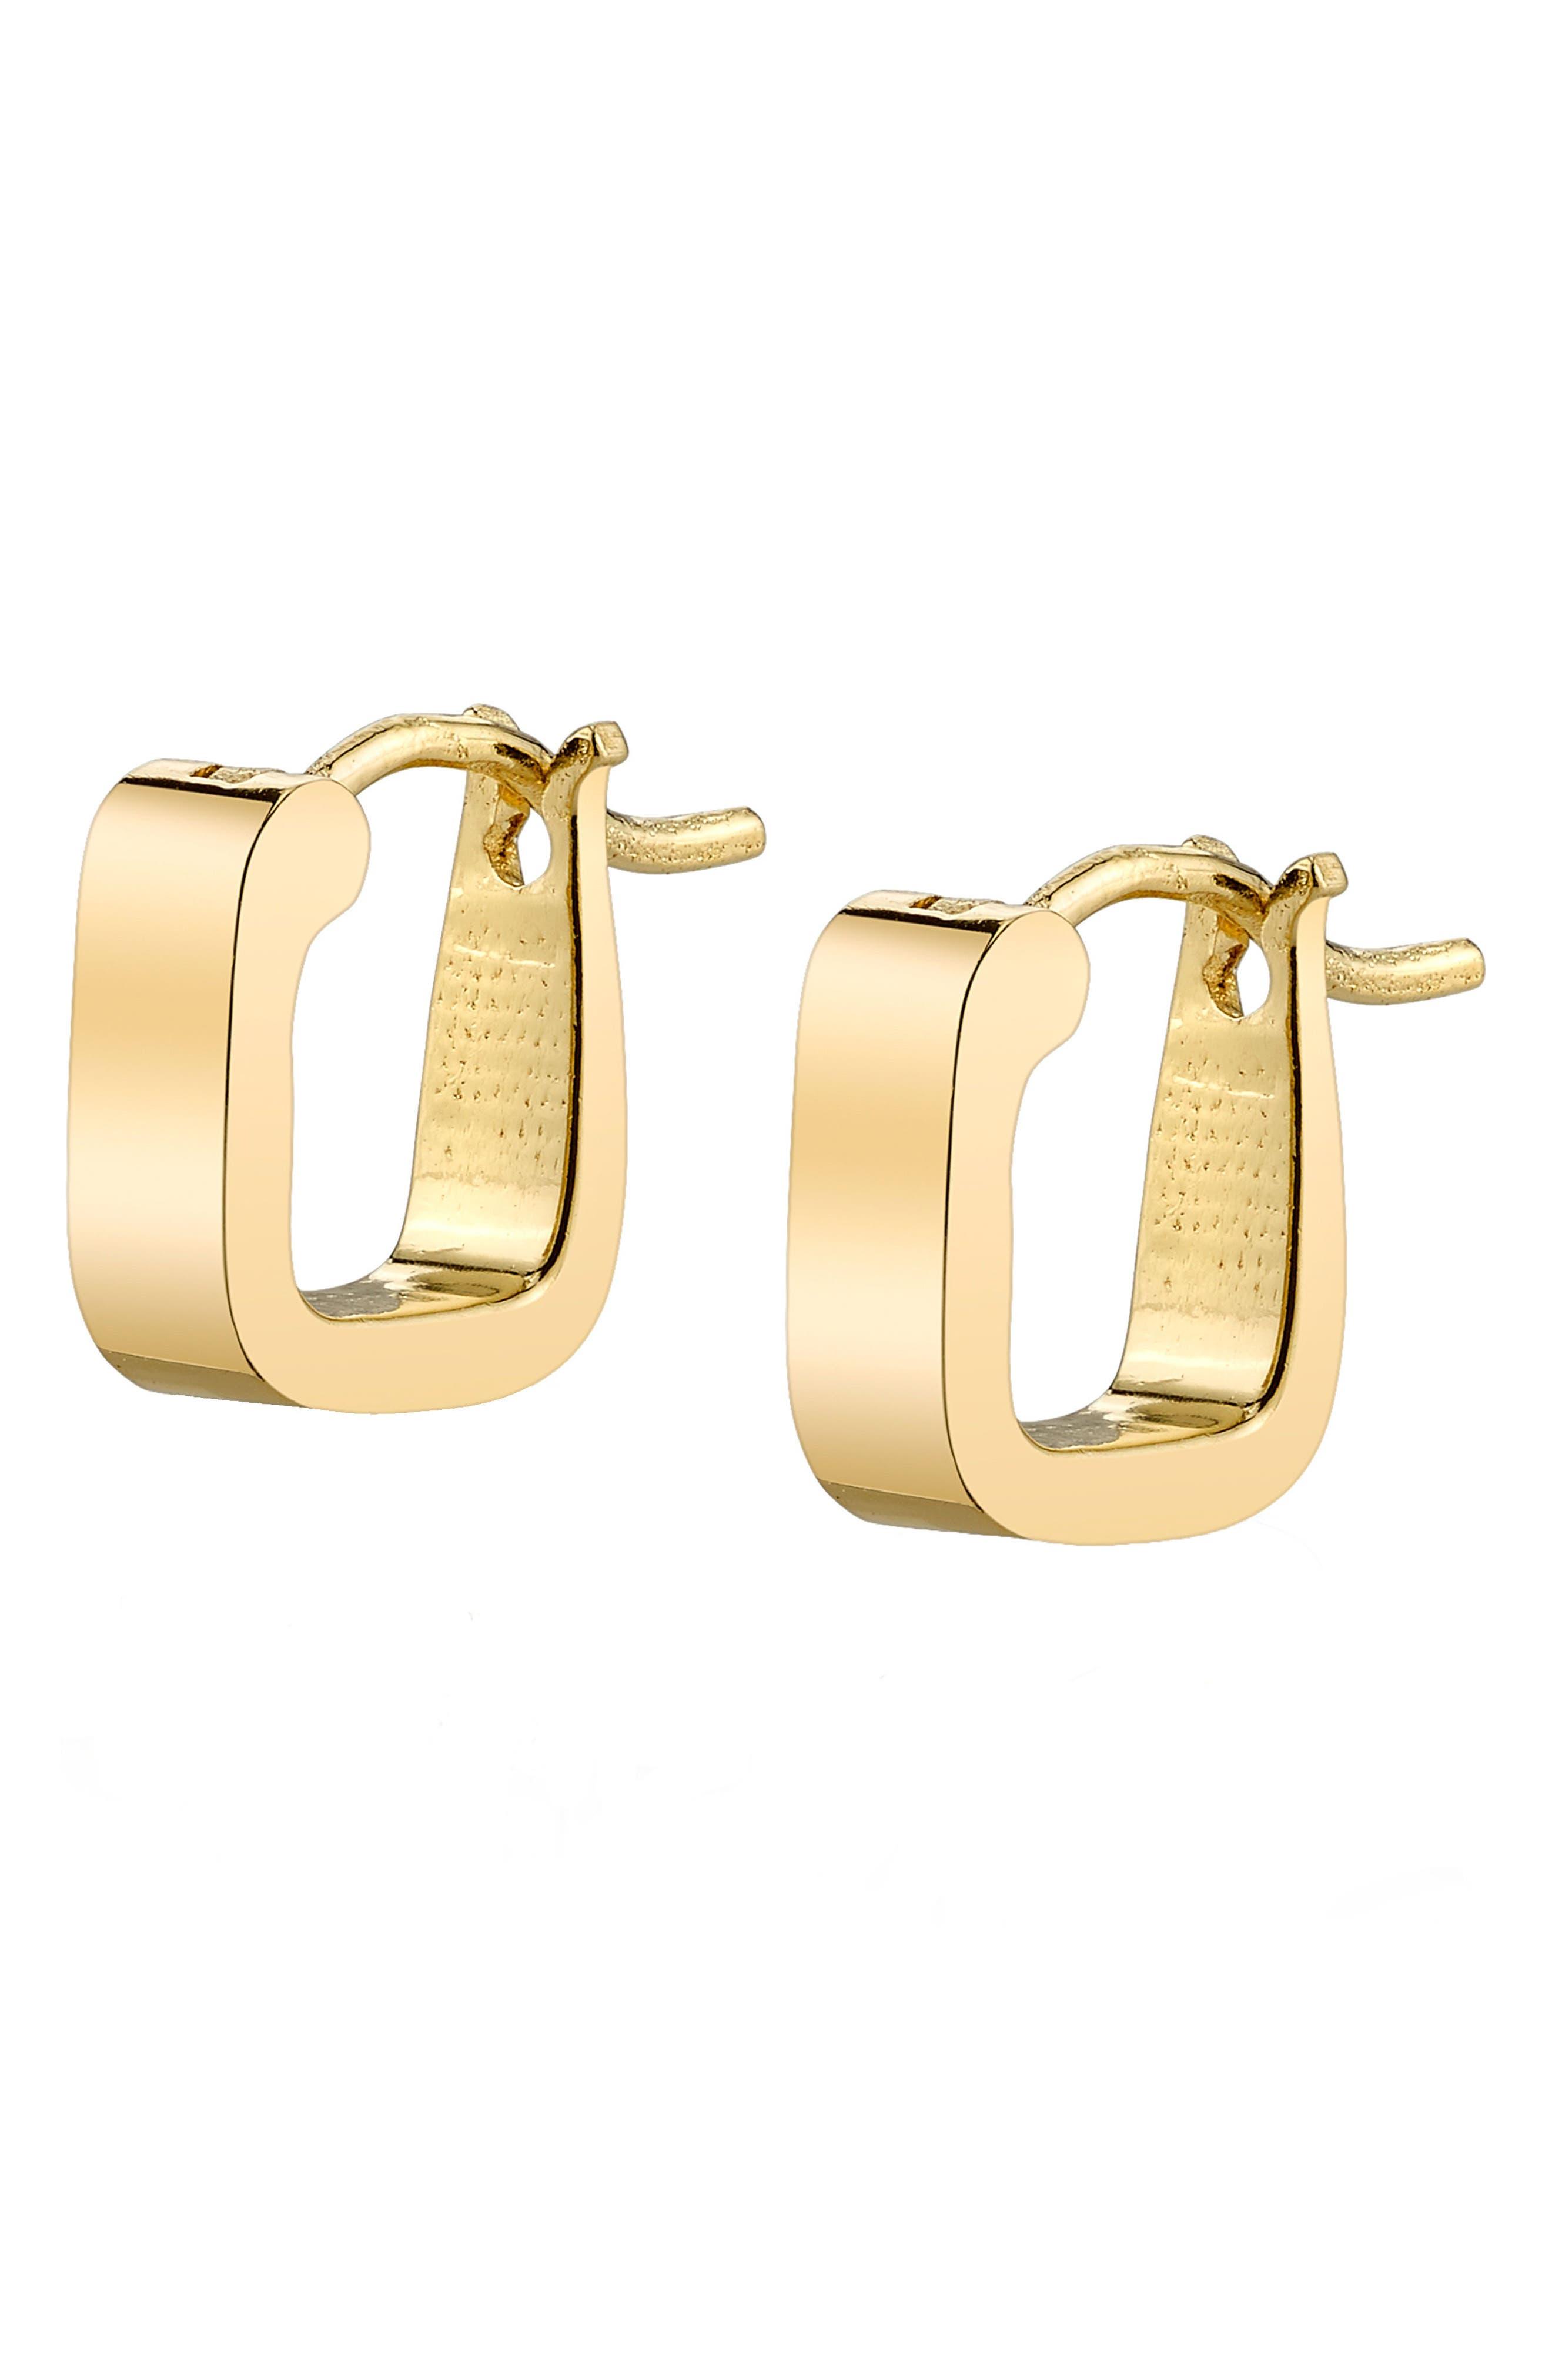 Iconery x Radisha Jones Hamsa Hand Stud Earrings